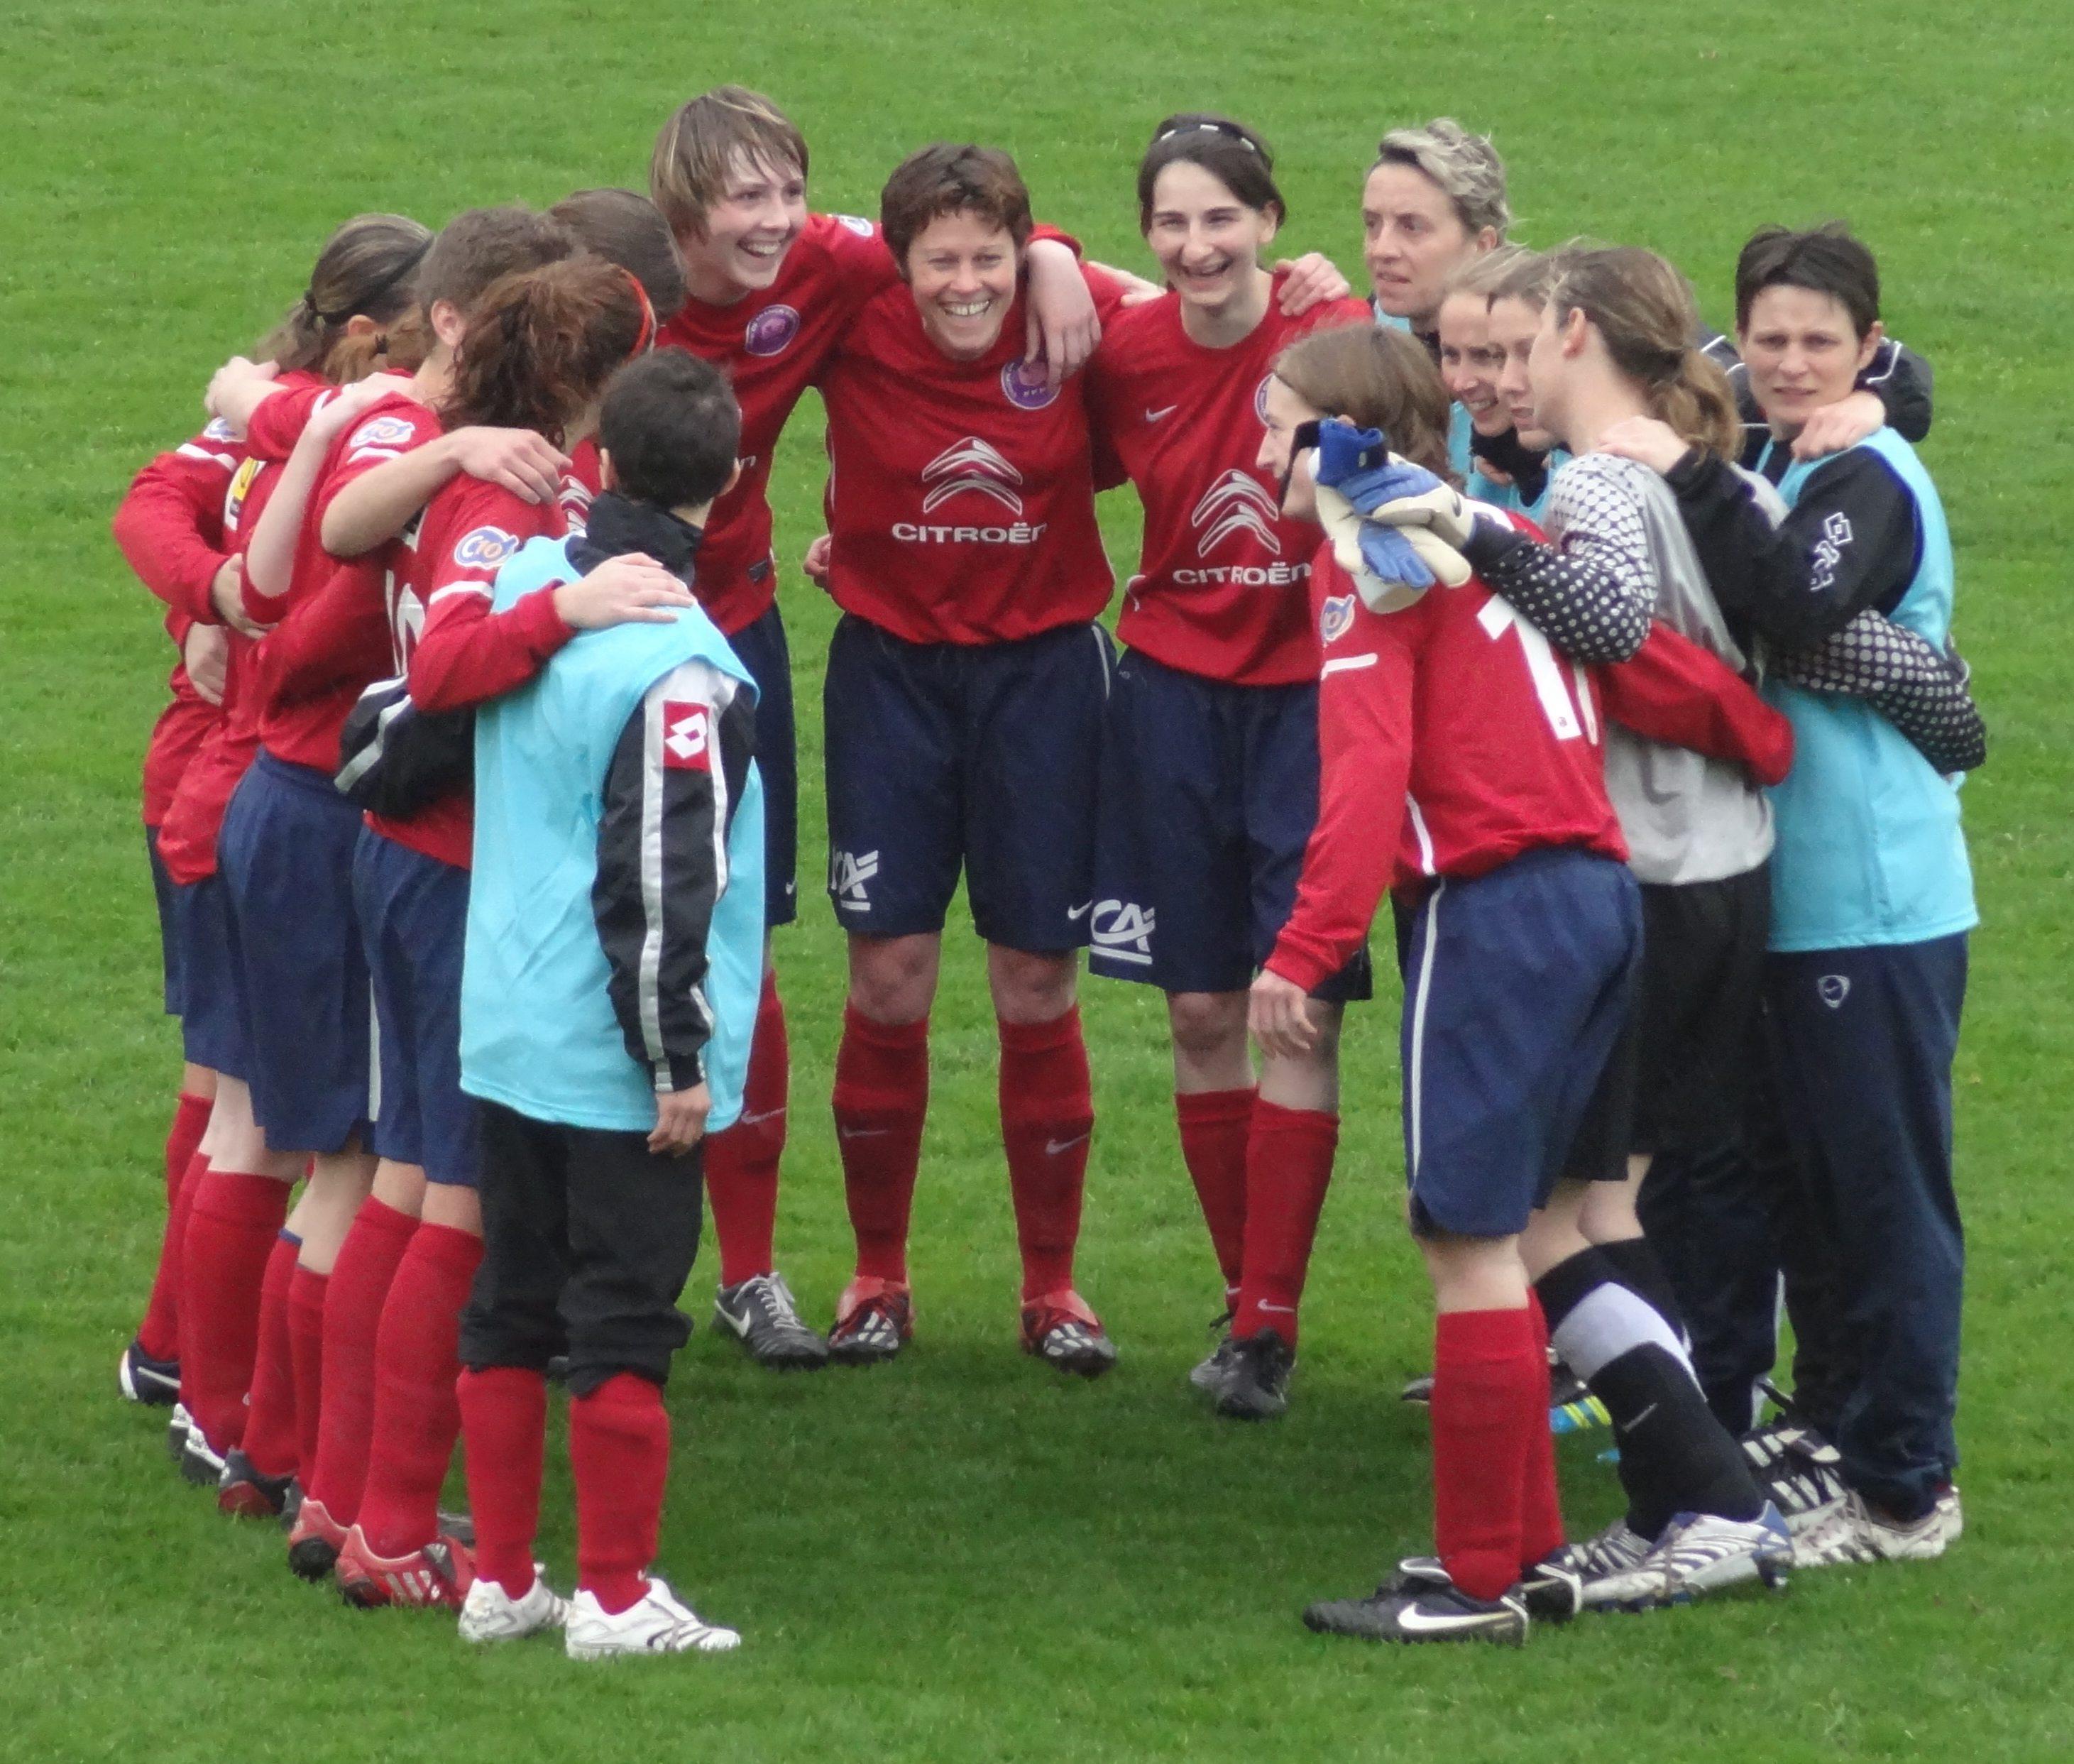 This Club amateur football feminin lyon casually